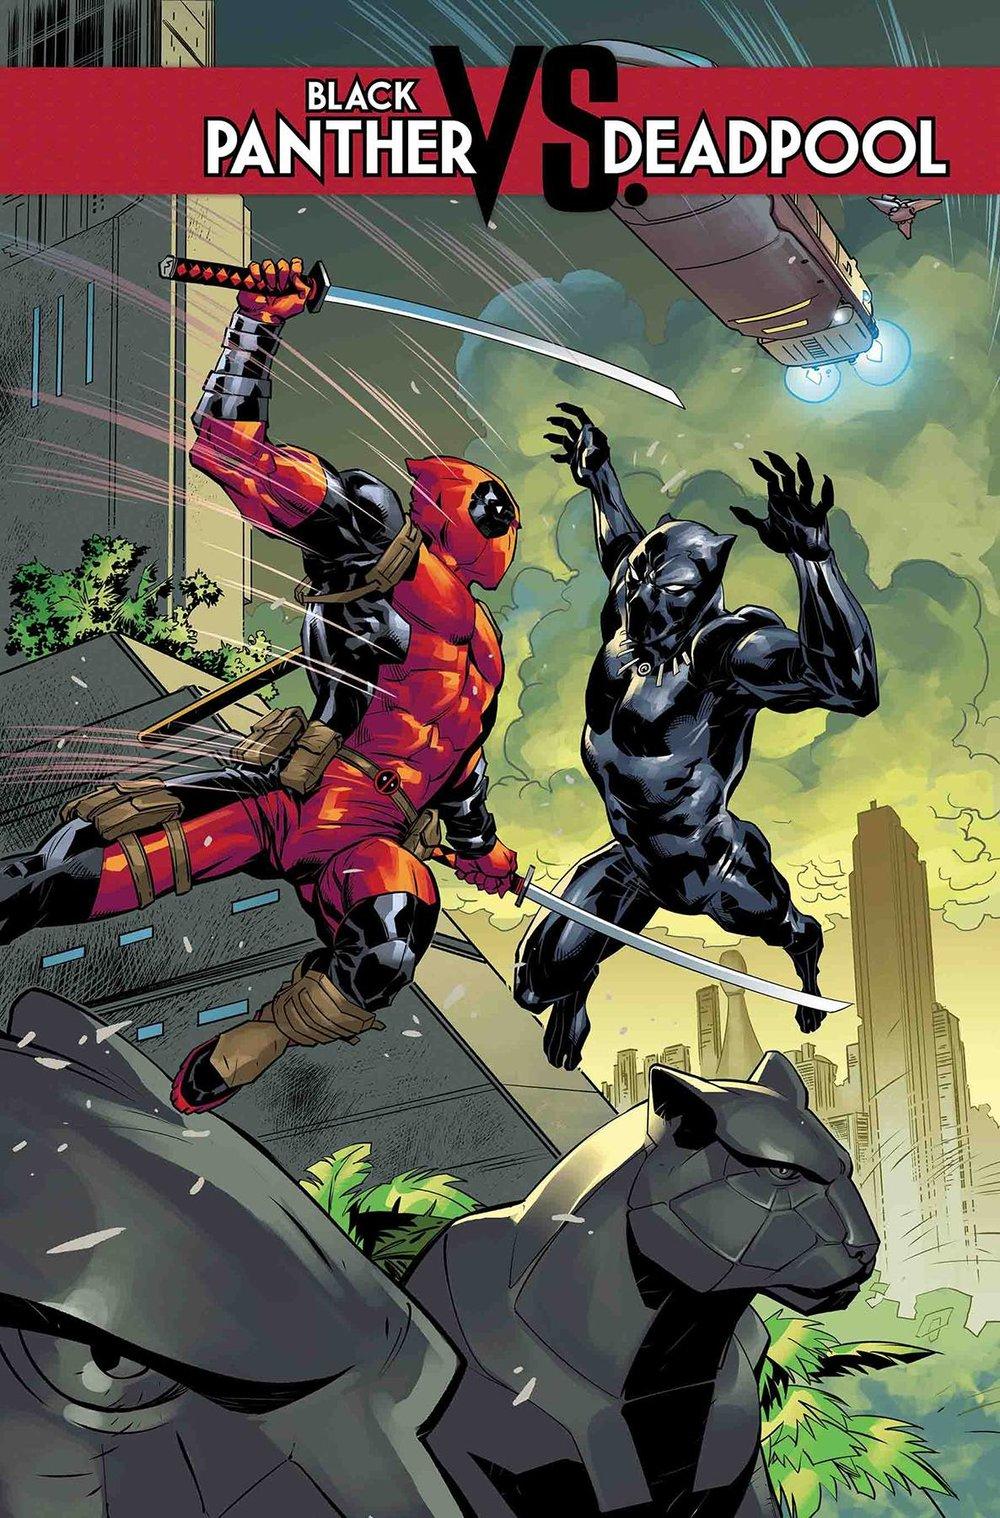 BLACK PANTHER VS. DEADPOOL #1 (of 5)